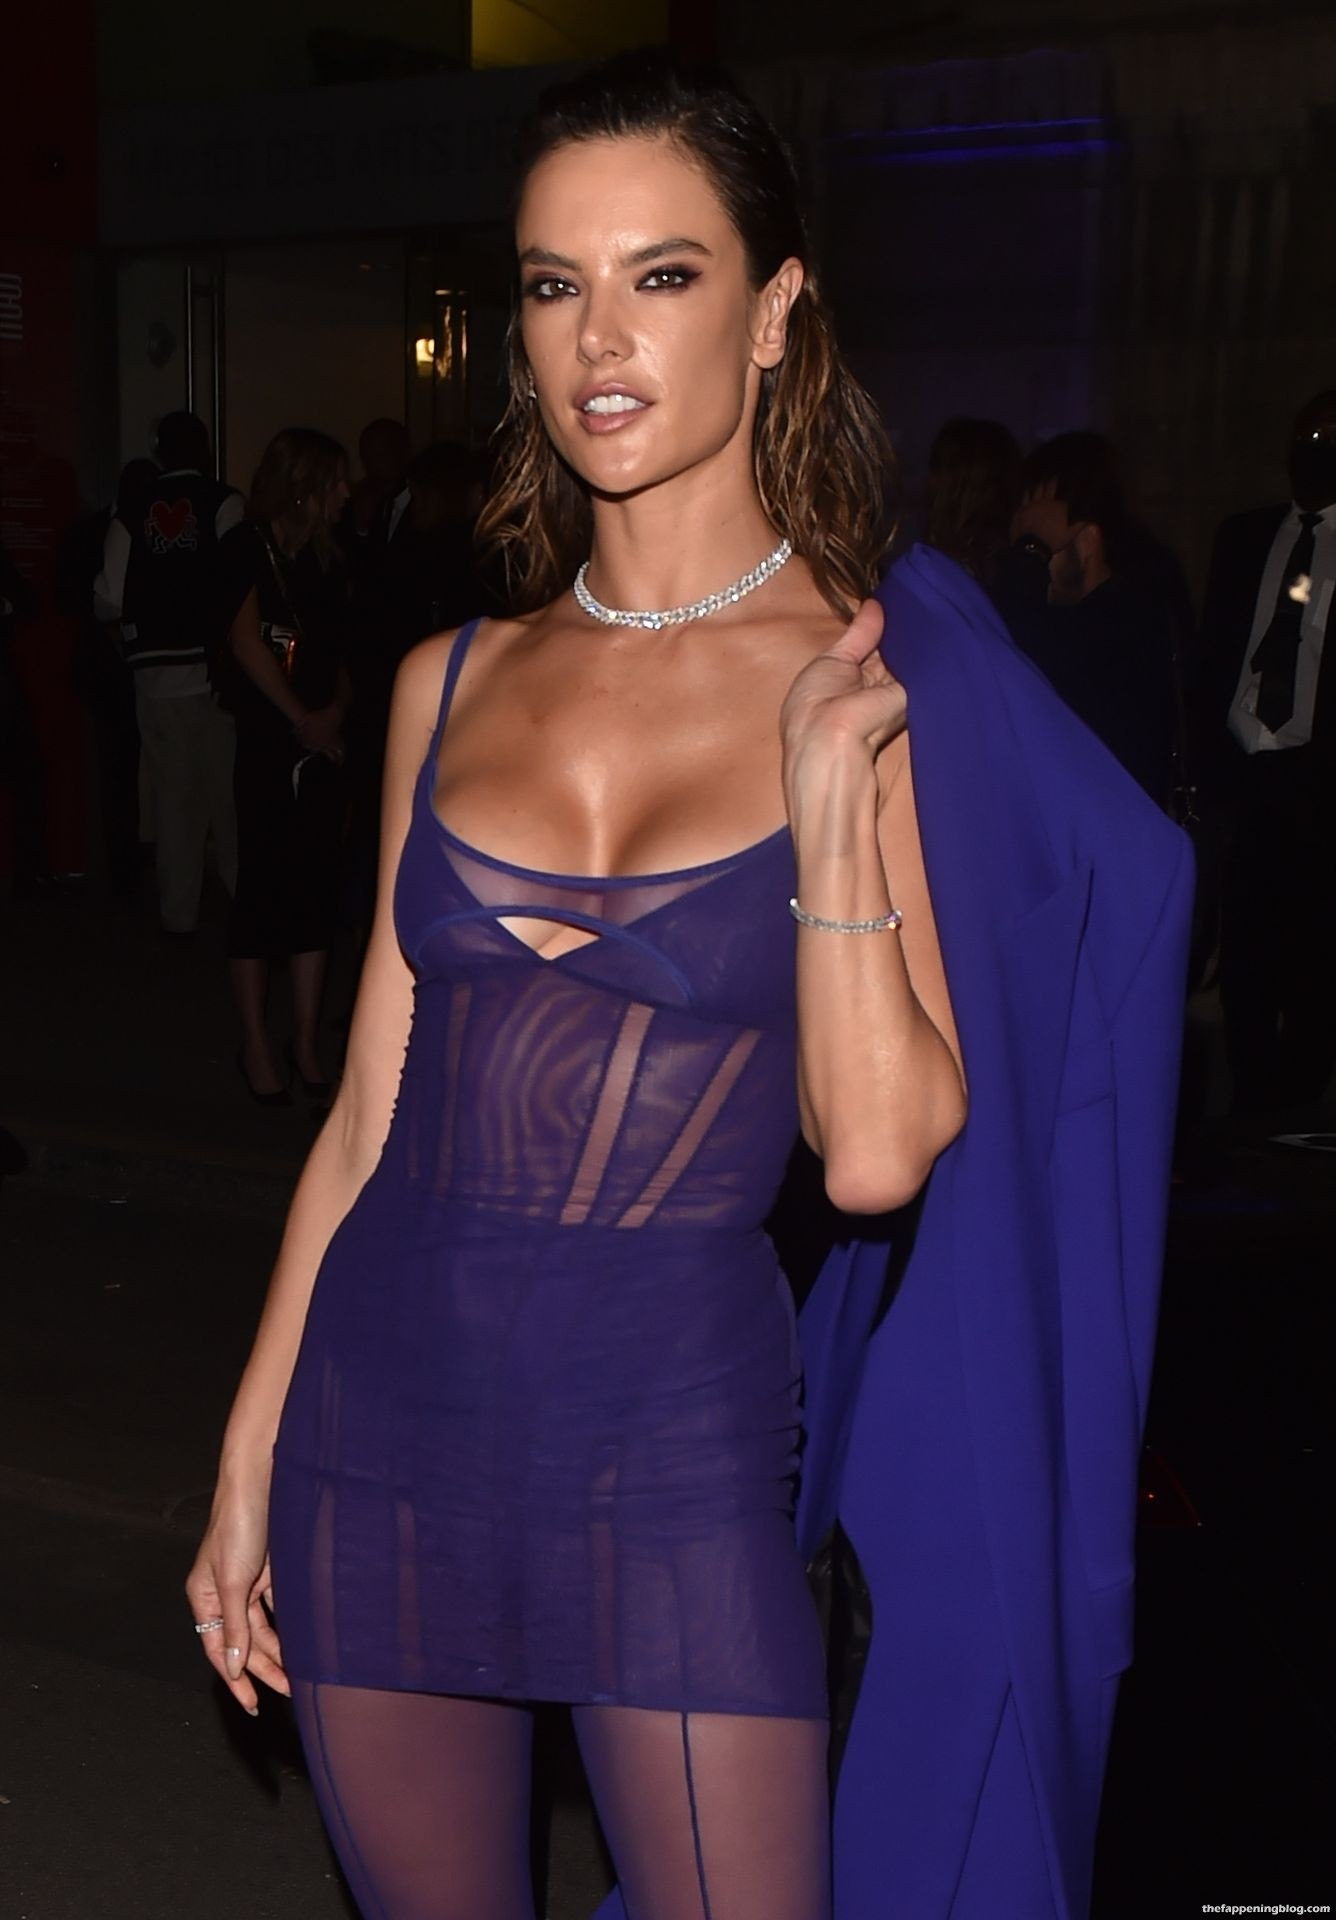 Alessandra-Ambrosio-Sexy-The-Fappening-Blog-20-3.jpg